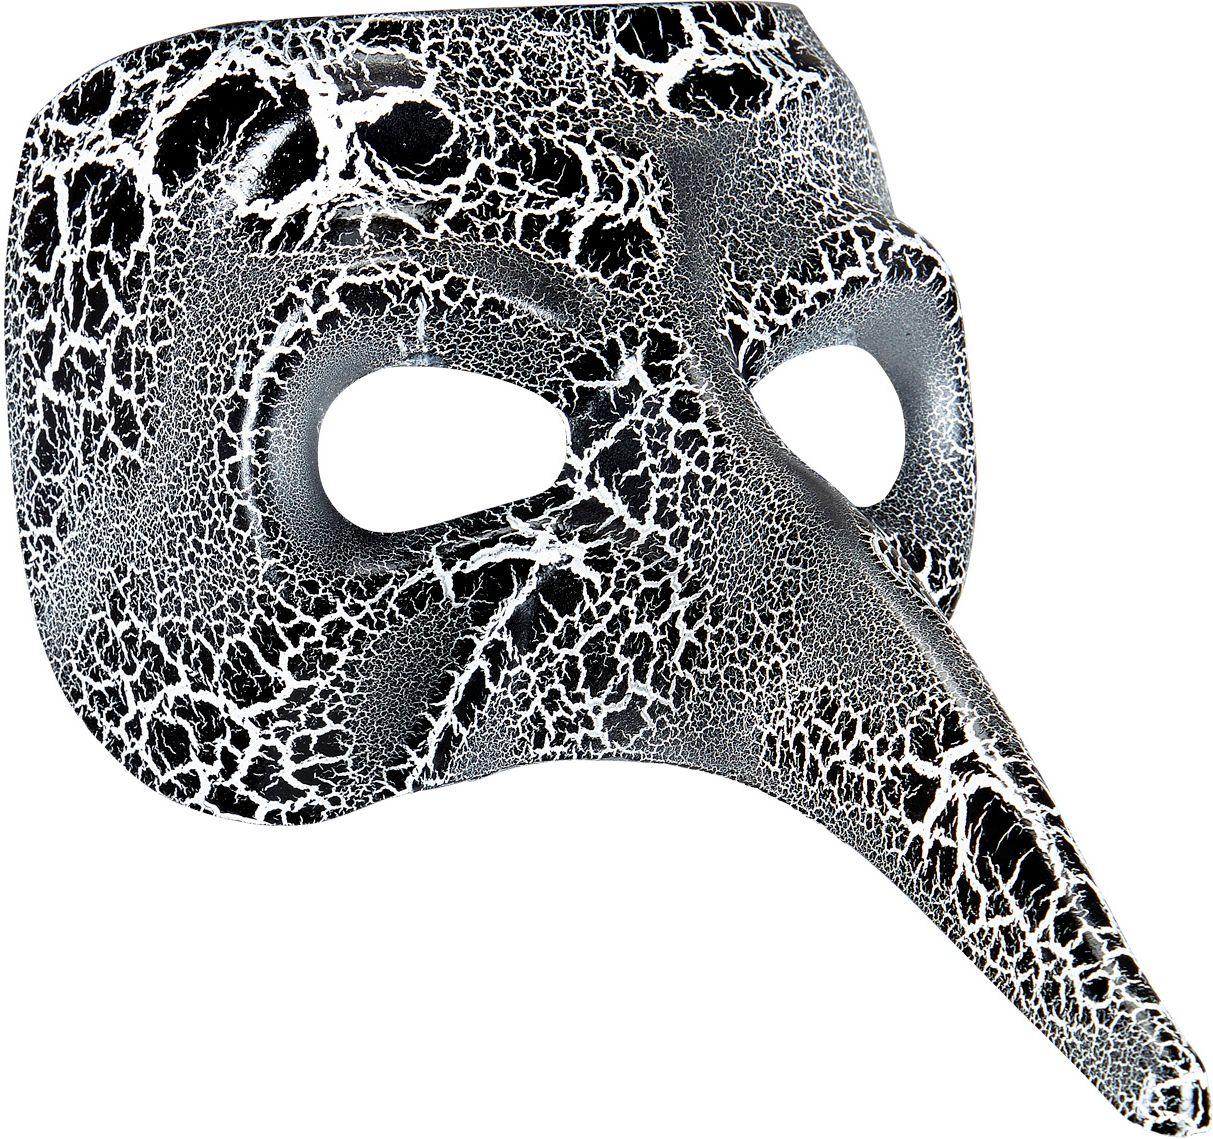 Zwart-wit gevlekt venetiaans nasone masker